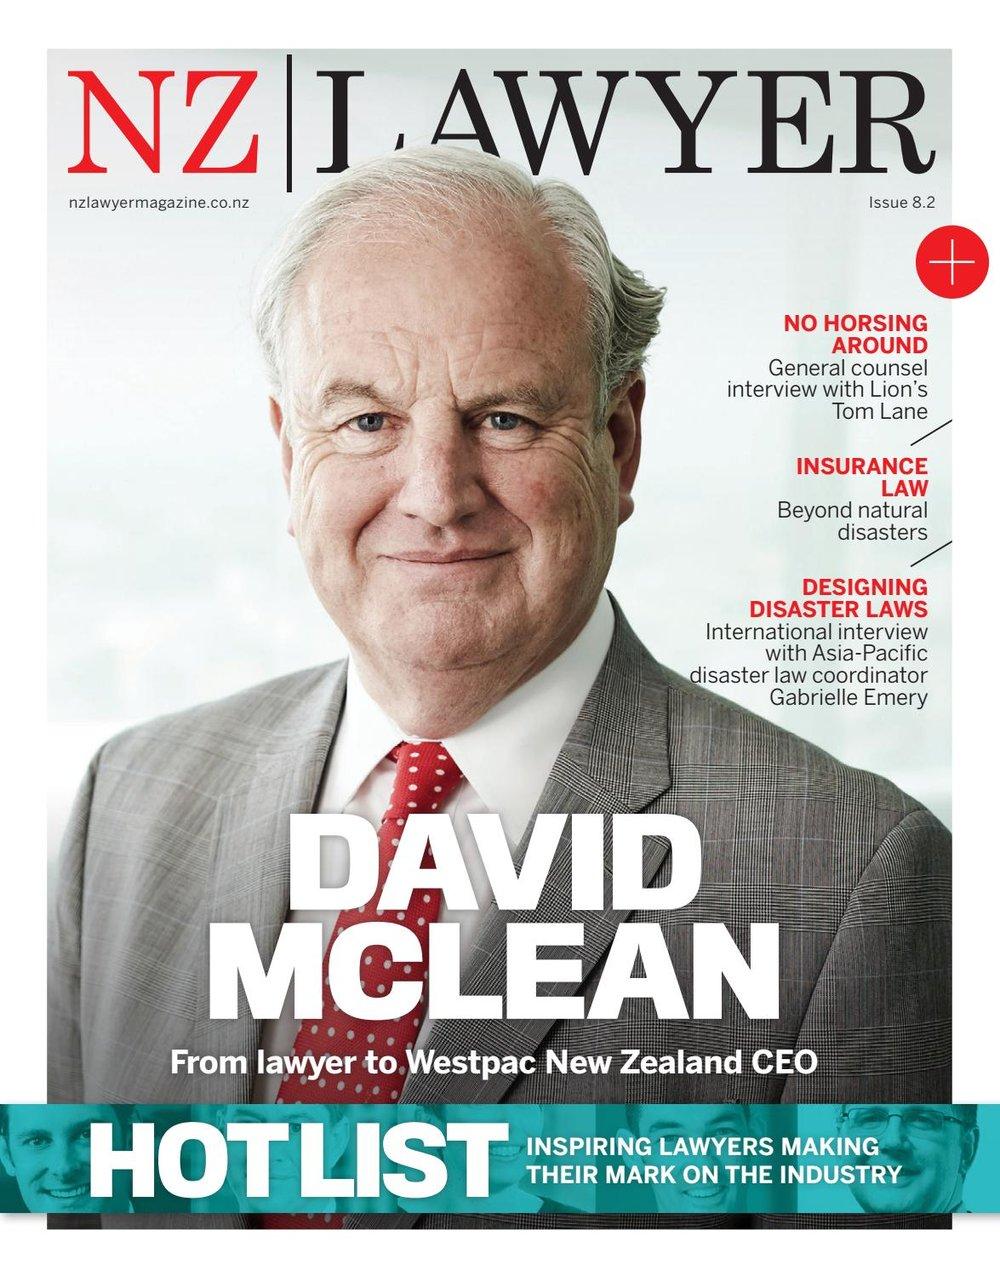 NZLawyer